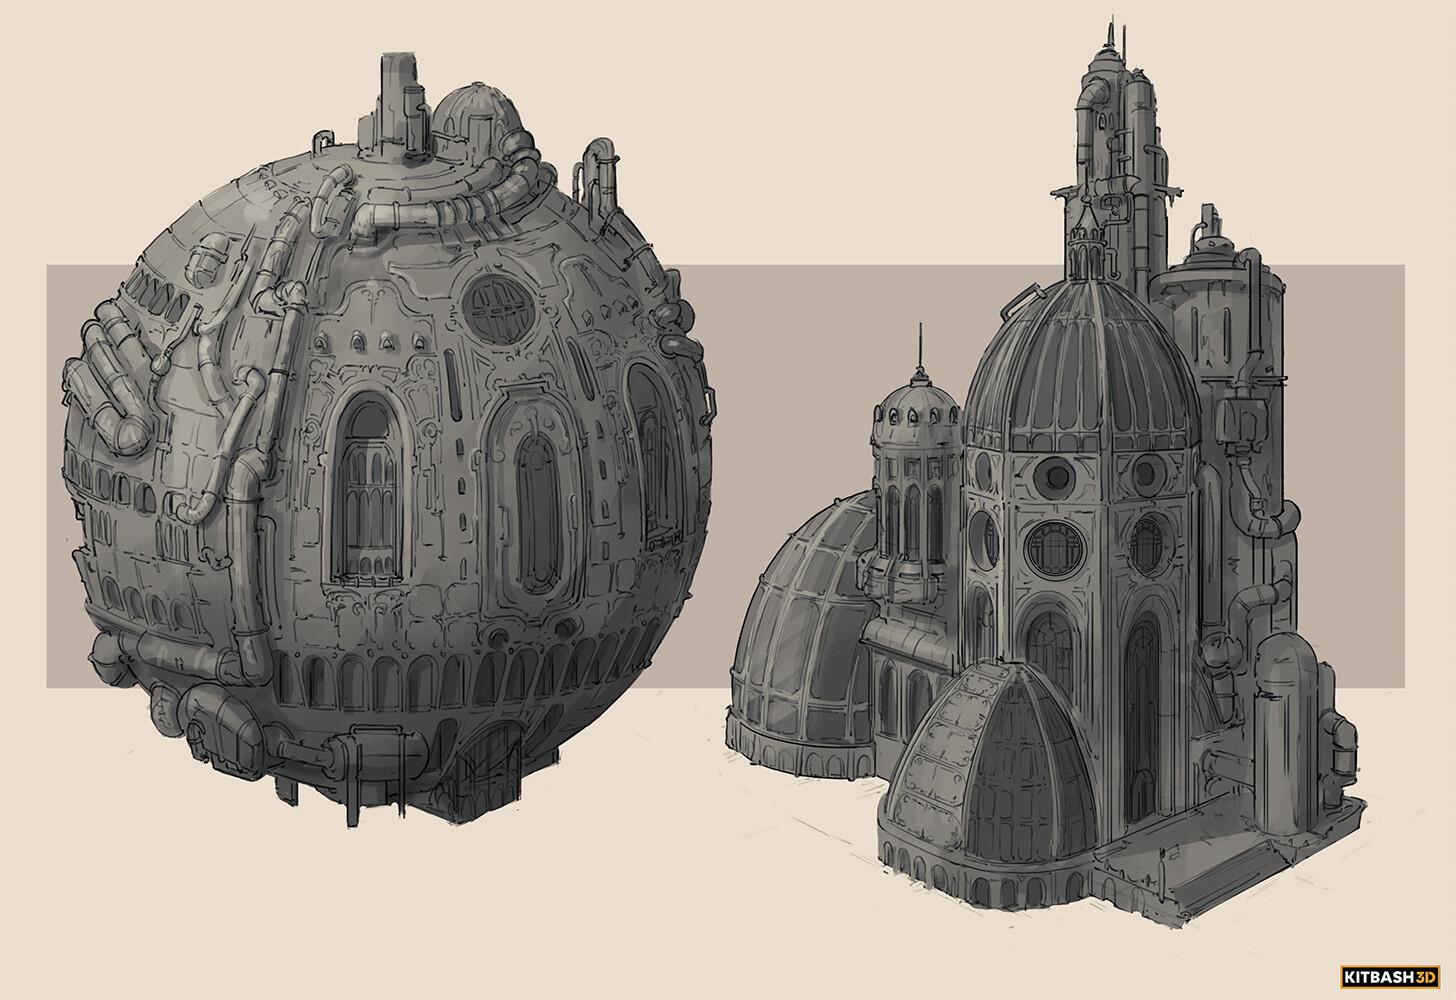 sebastian-luca-kb3d-steampunk-0004-layer-2-copy-4.jpg